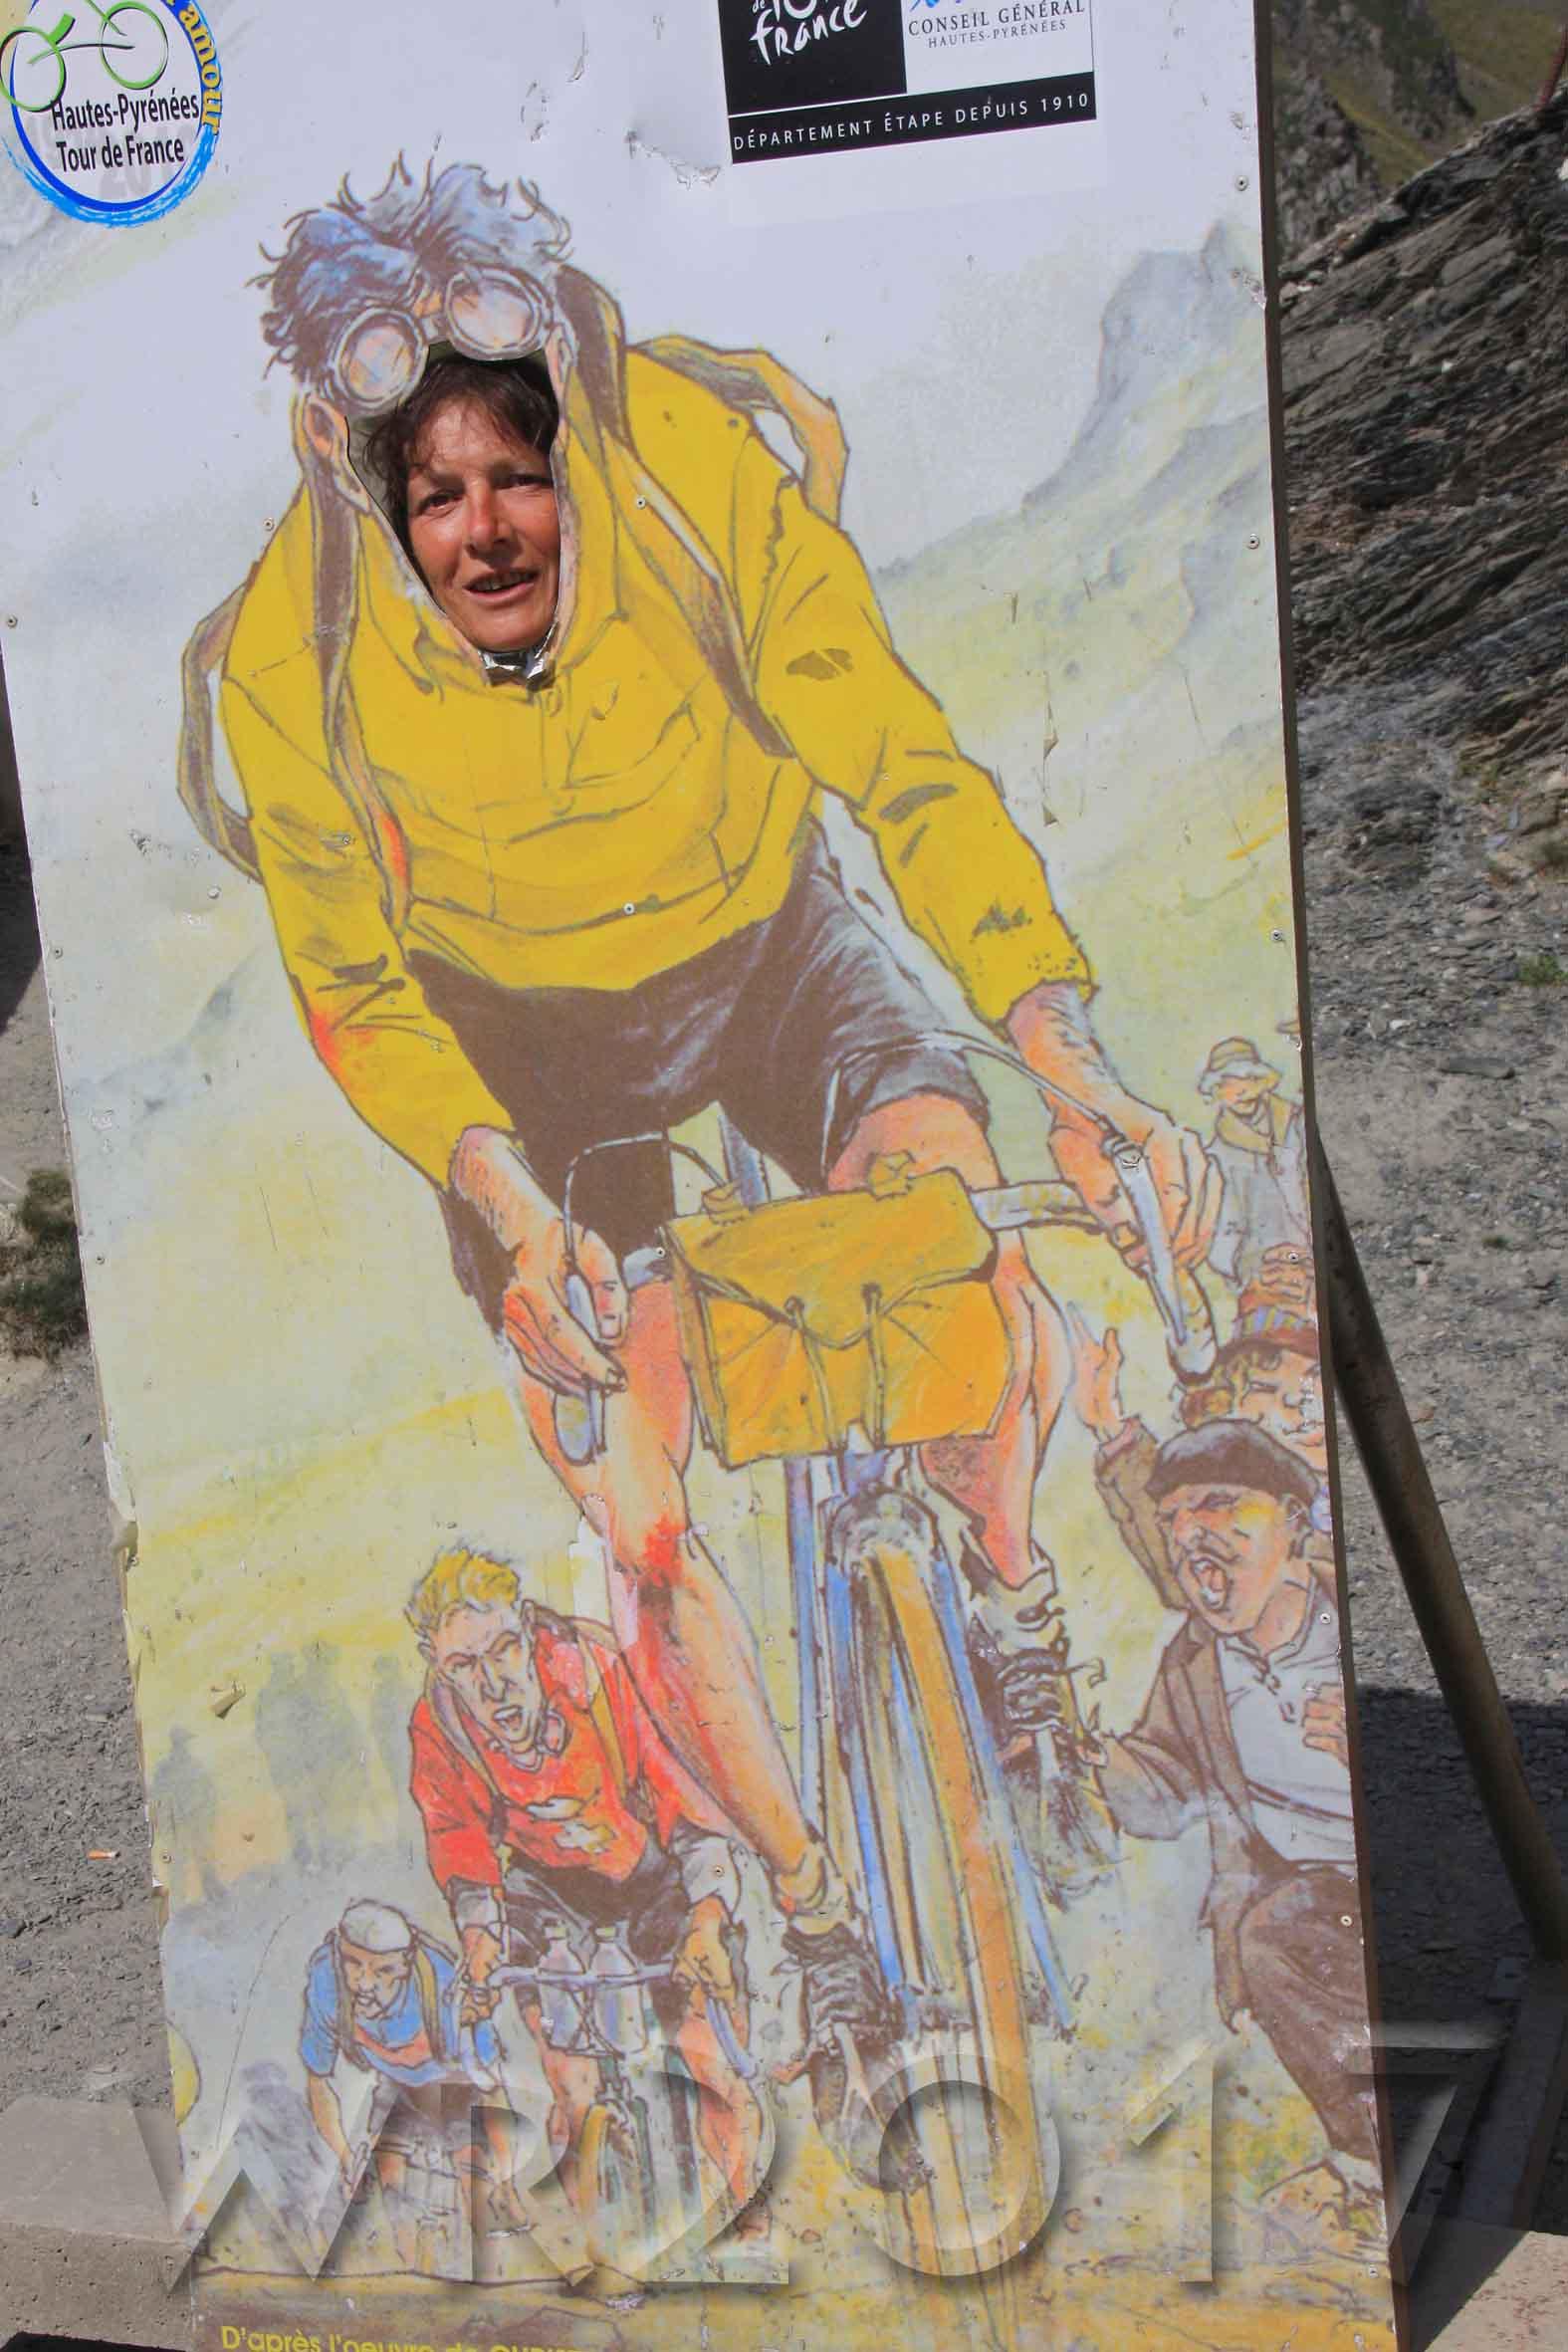 Col du Tourmalet, 2017, Autor: Wolfgang Randelzhofer